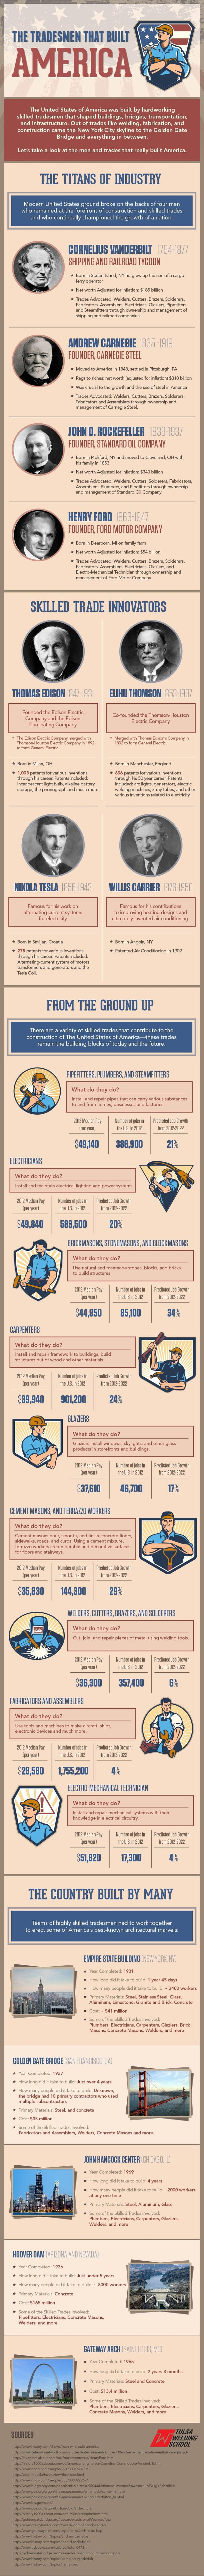 Innovative, Innovation, Tradesmen, Made in USA, skilled workers, Skills Gap